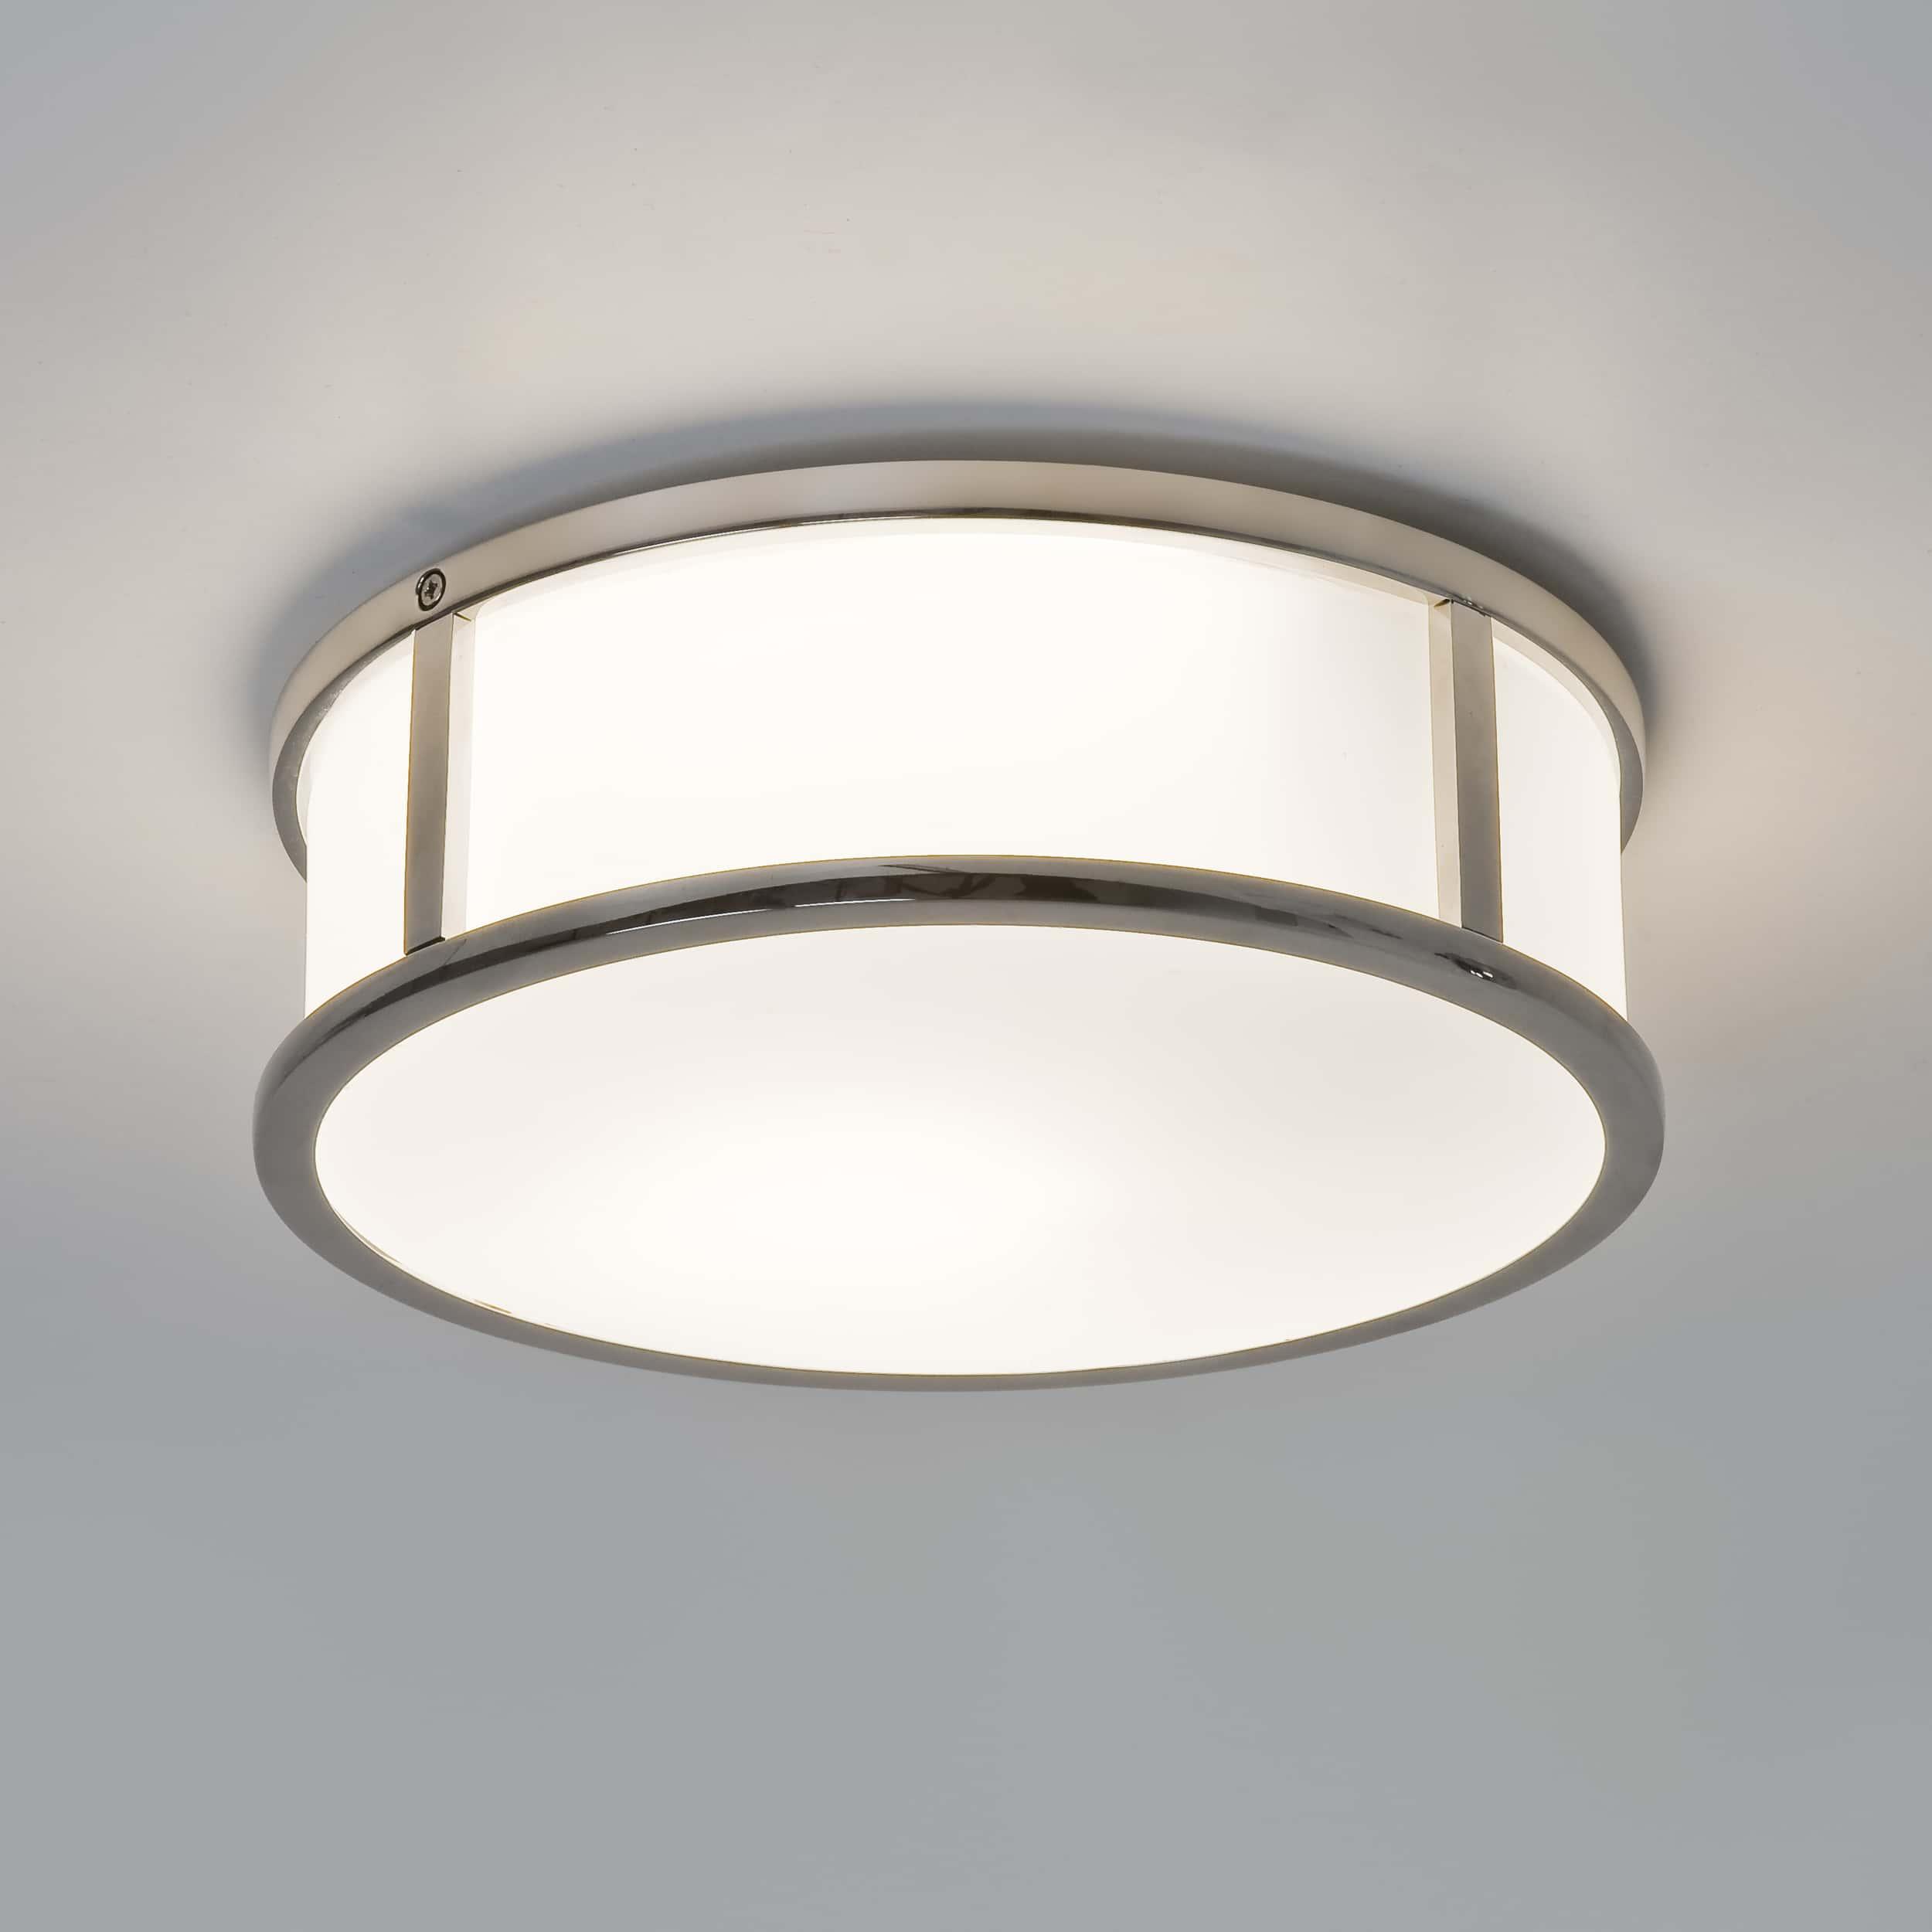 Mashiko Round 230 Ceiling Light Buy Online Now At All Square Lighting